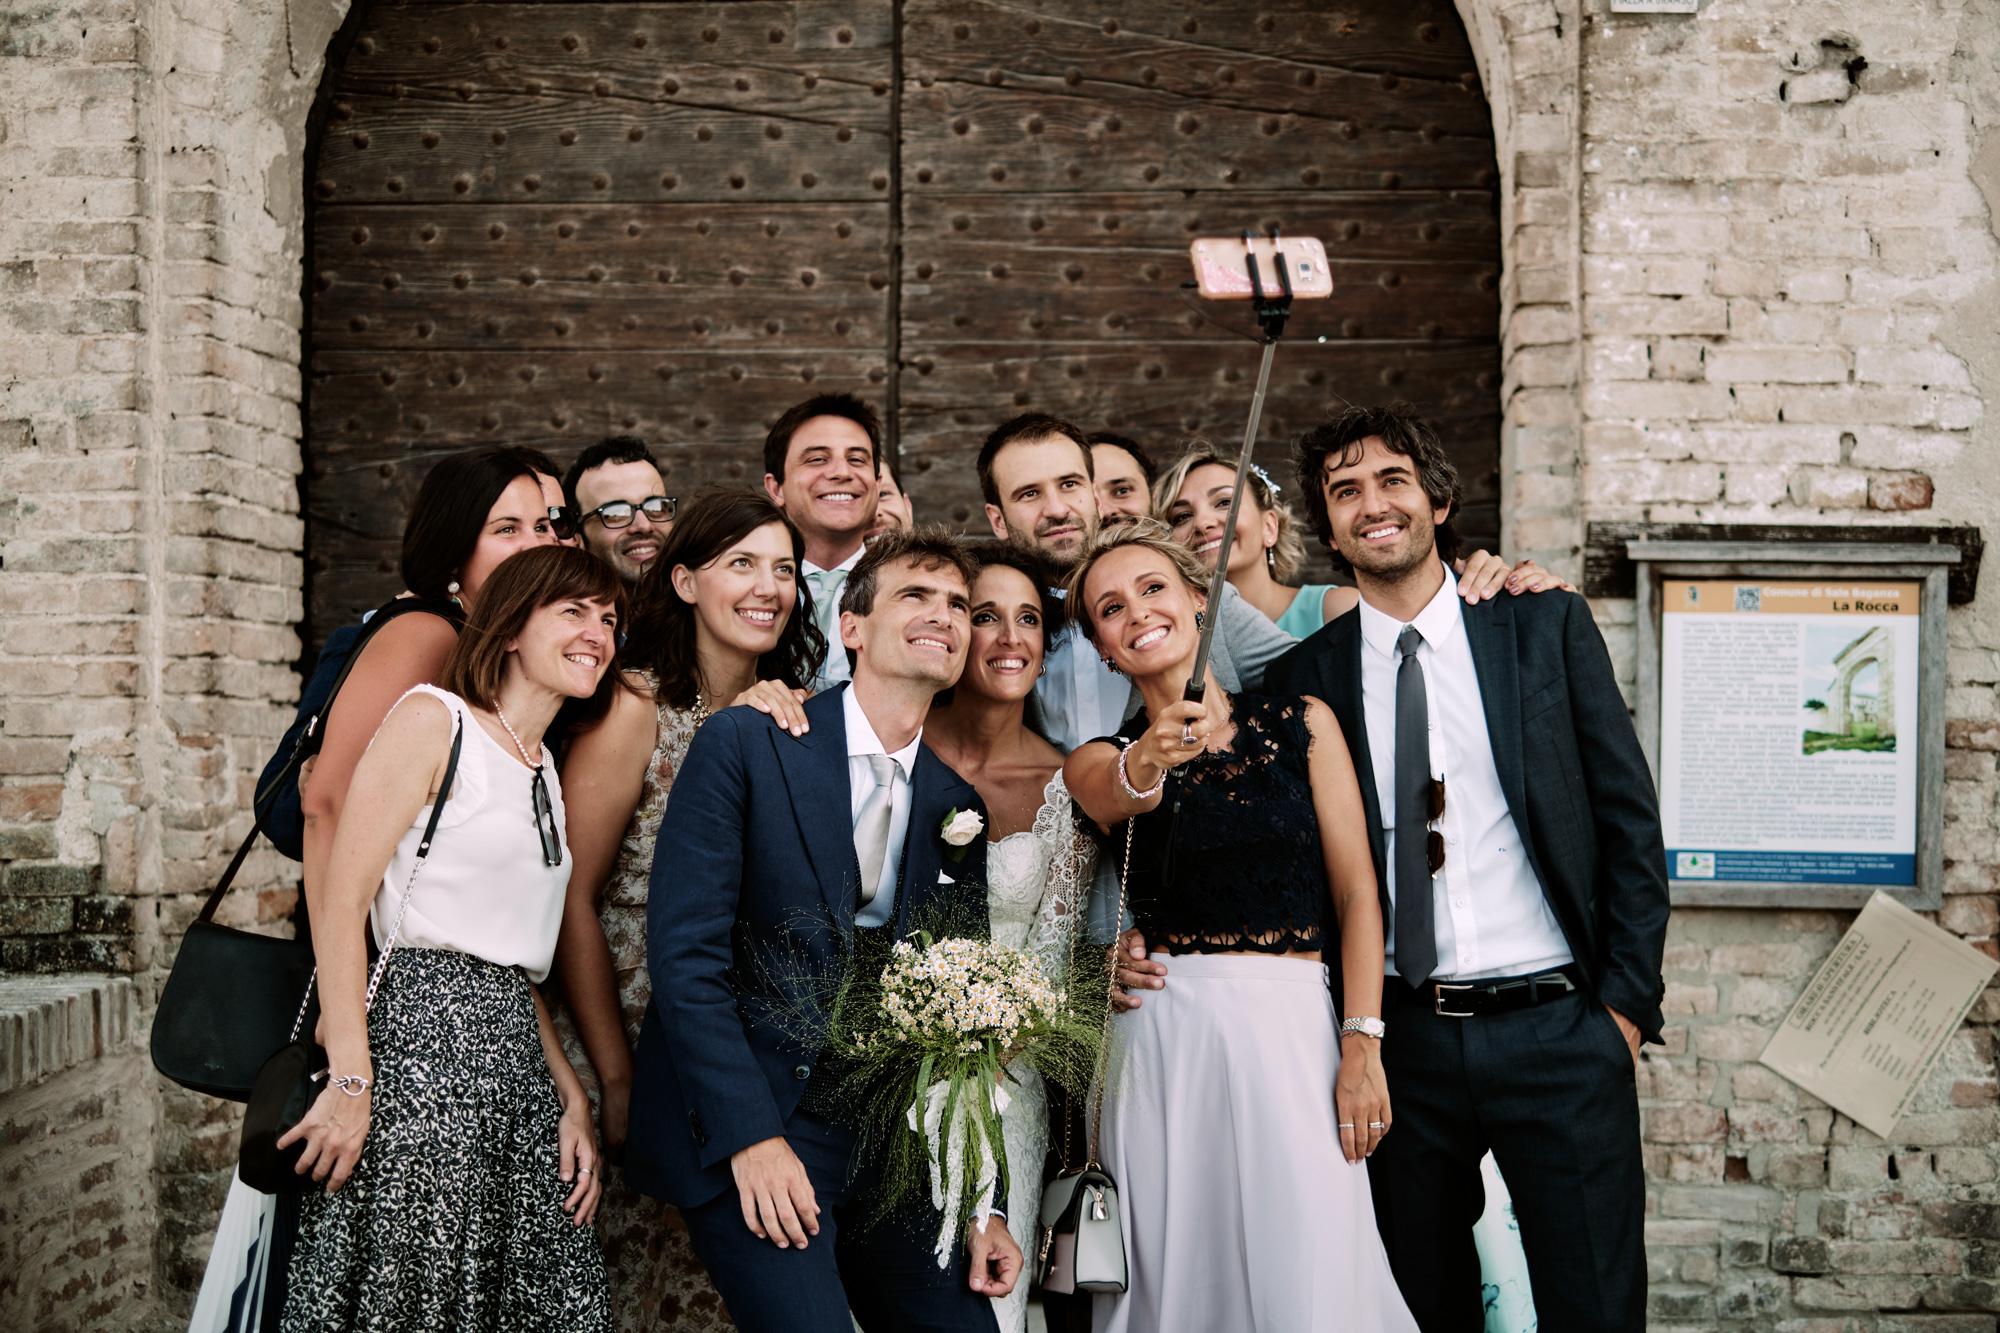 33-ivano_di_maria_fotografo_matrimonio_ margh_loren